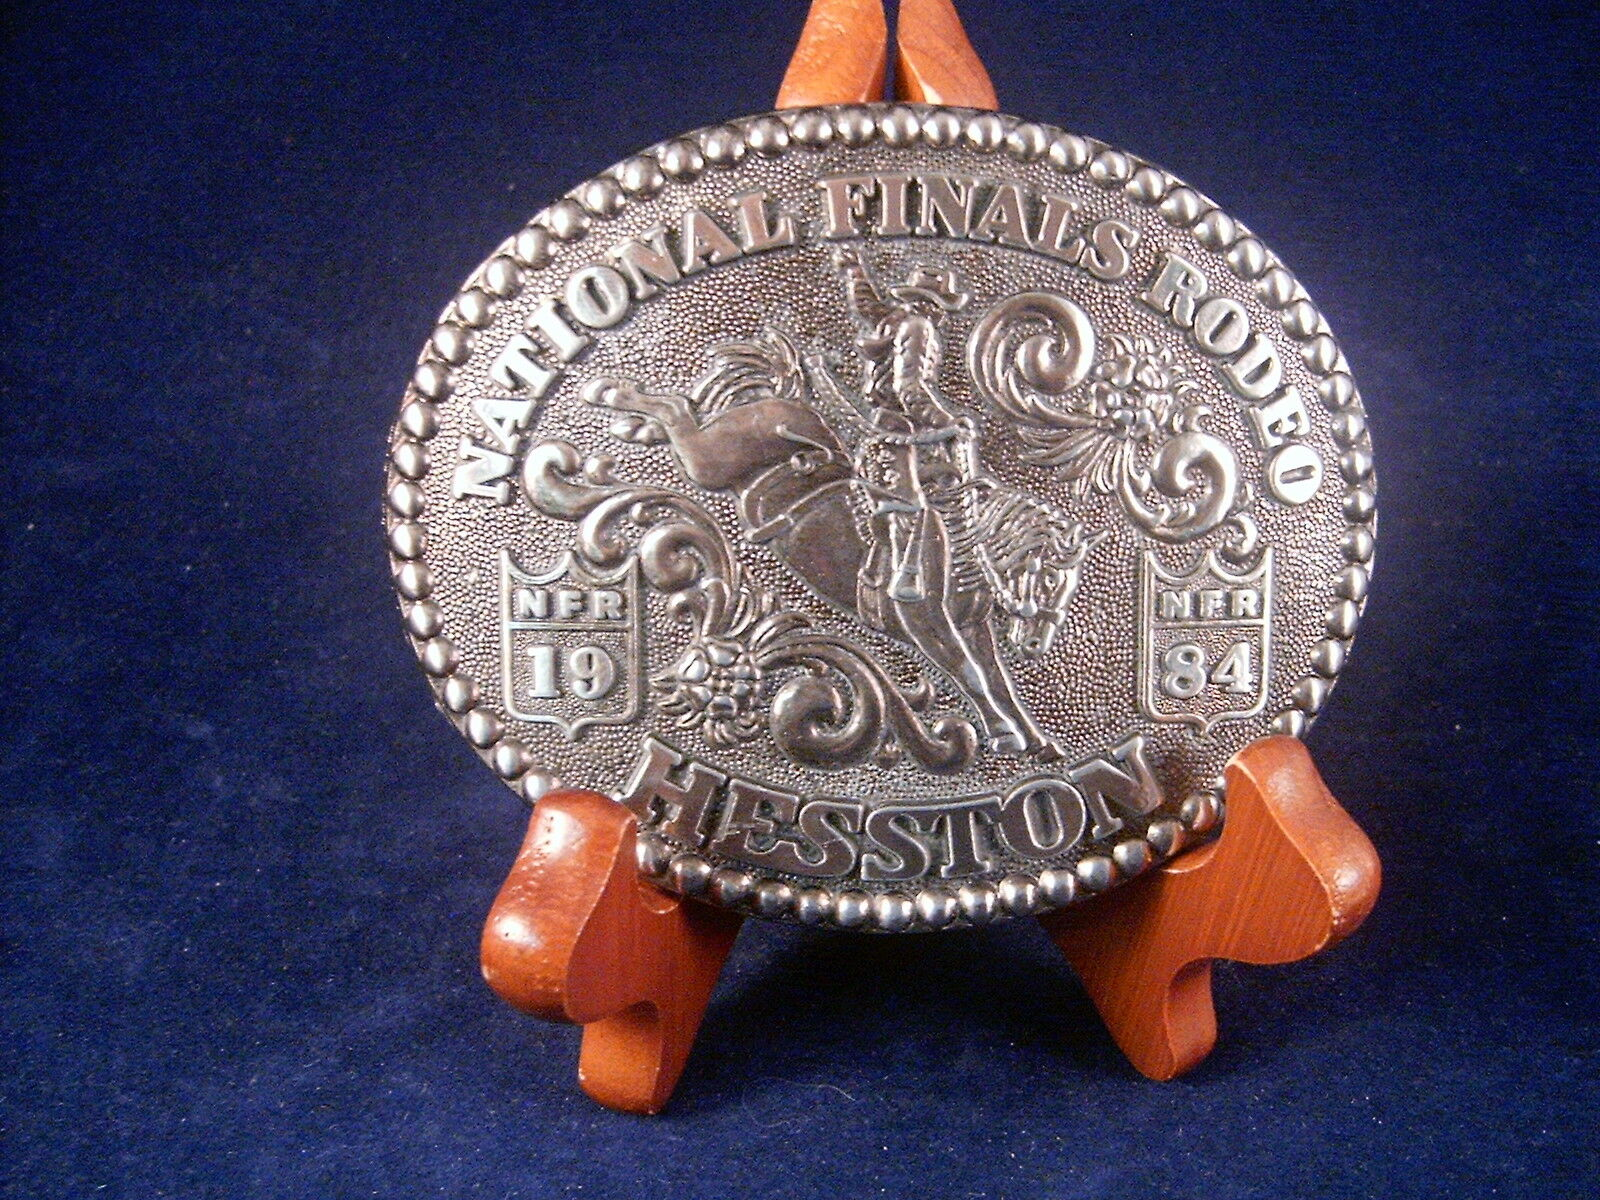 1984 HESSTON NATIONAL FINALS RODEO ANNIVERSARY SERIES BELT BUCKLE  - $9.99